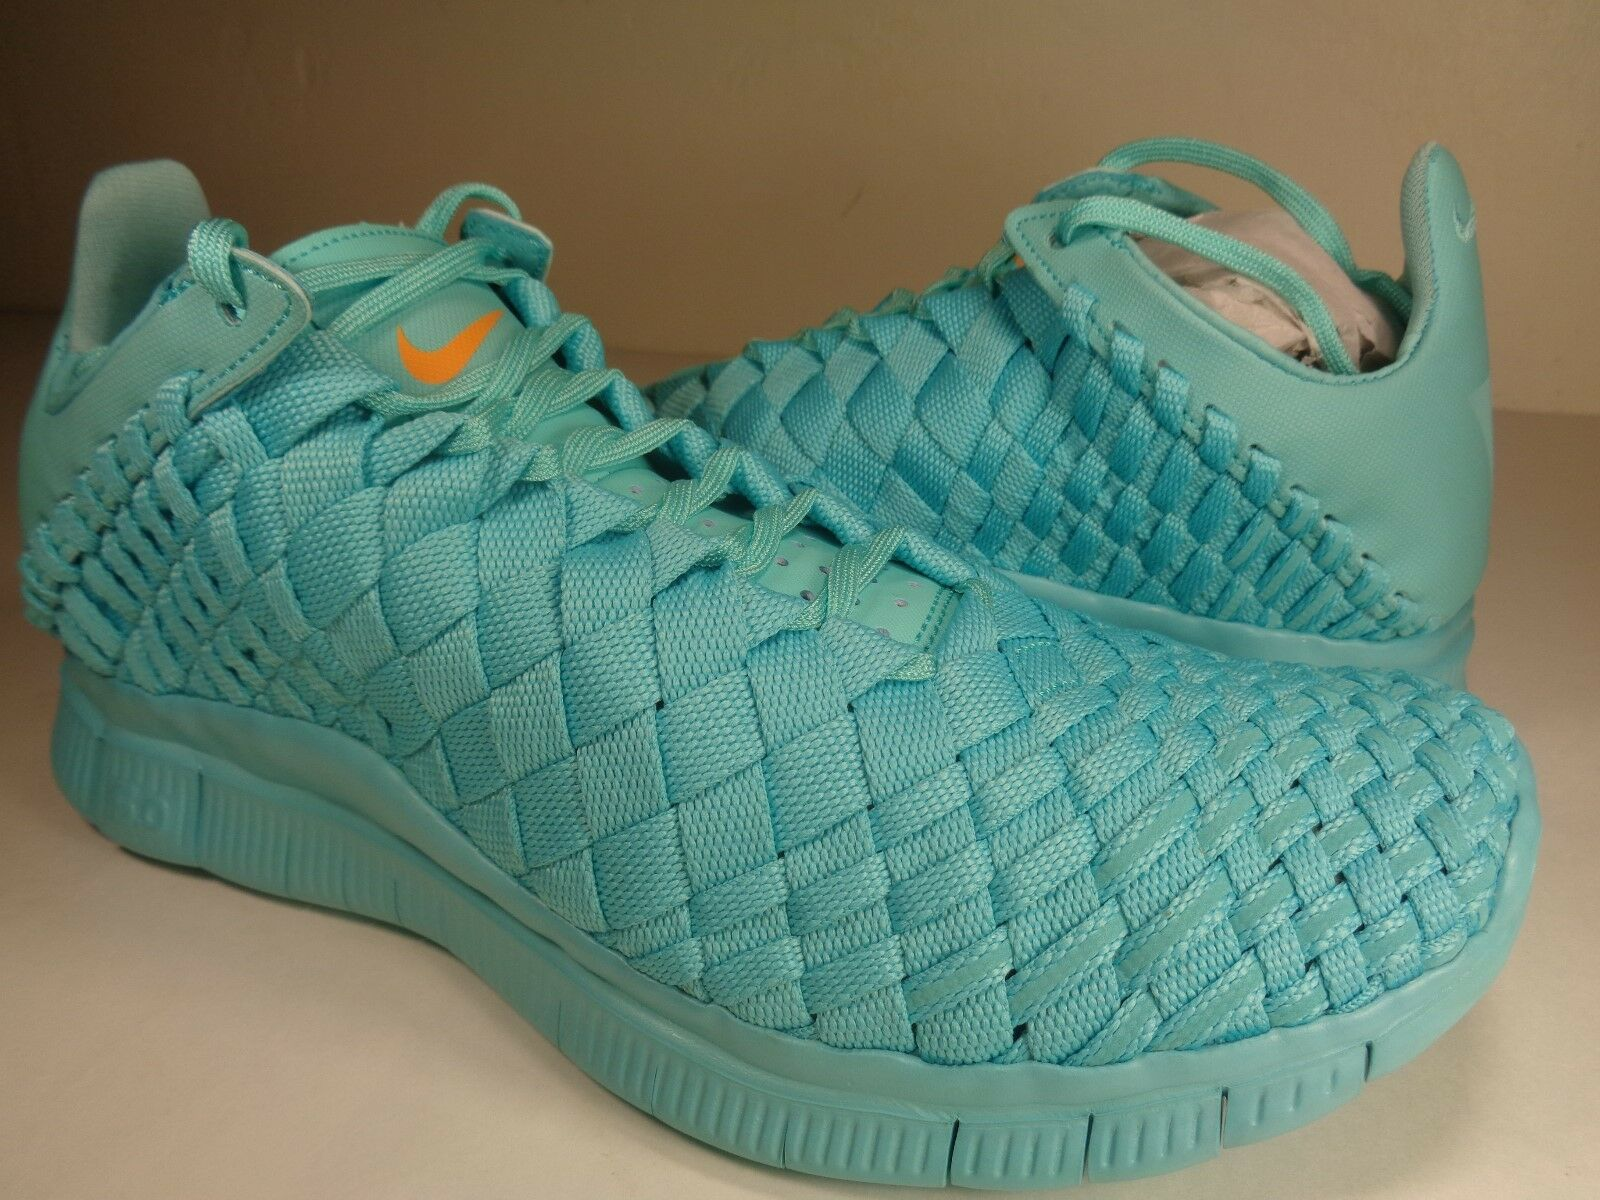 Nike libera inneva tessuti tecnici sp acquamarina acquamarina sp kumquat sz 7,5 (705797-448) 370ead